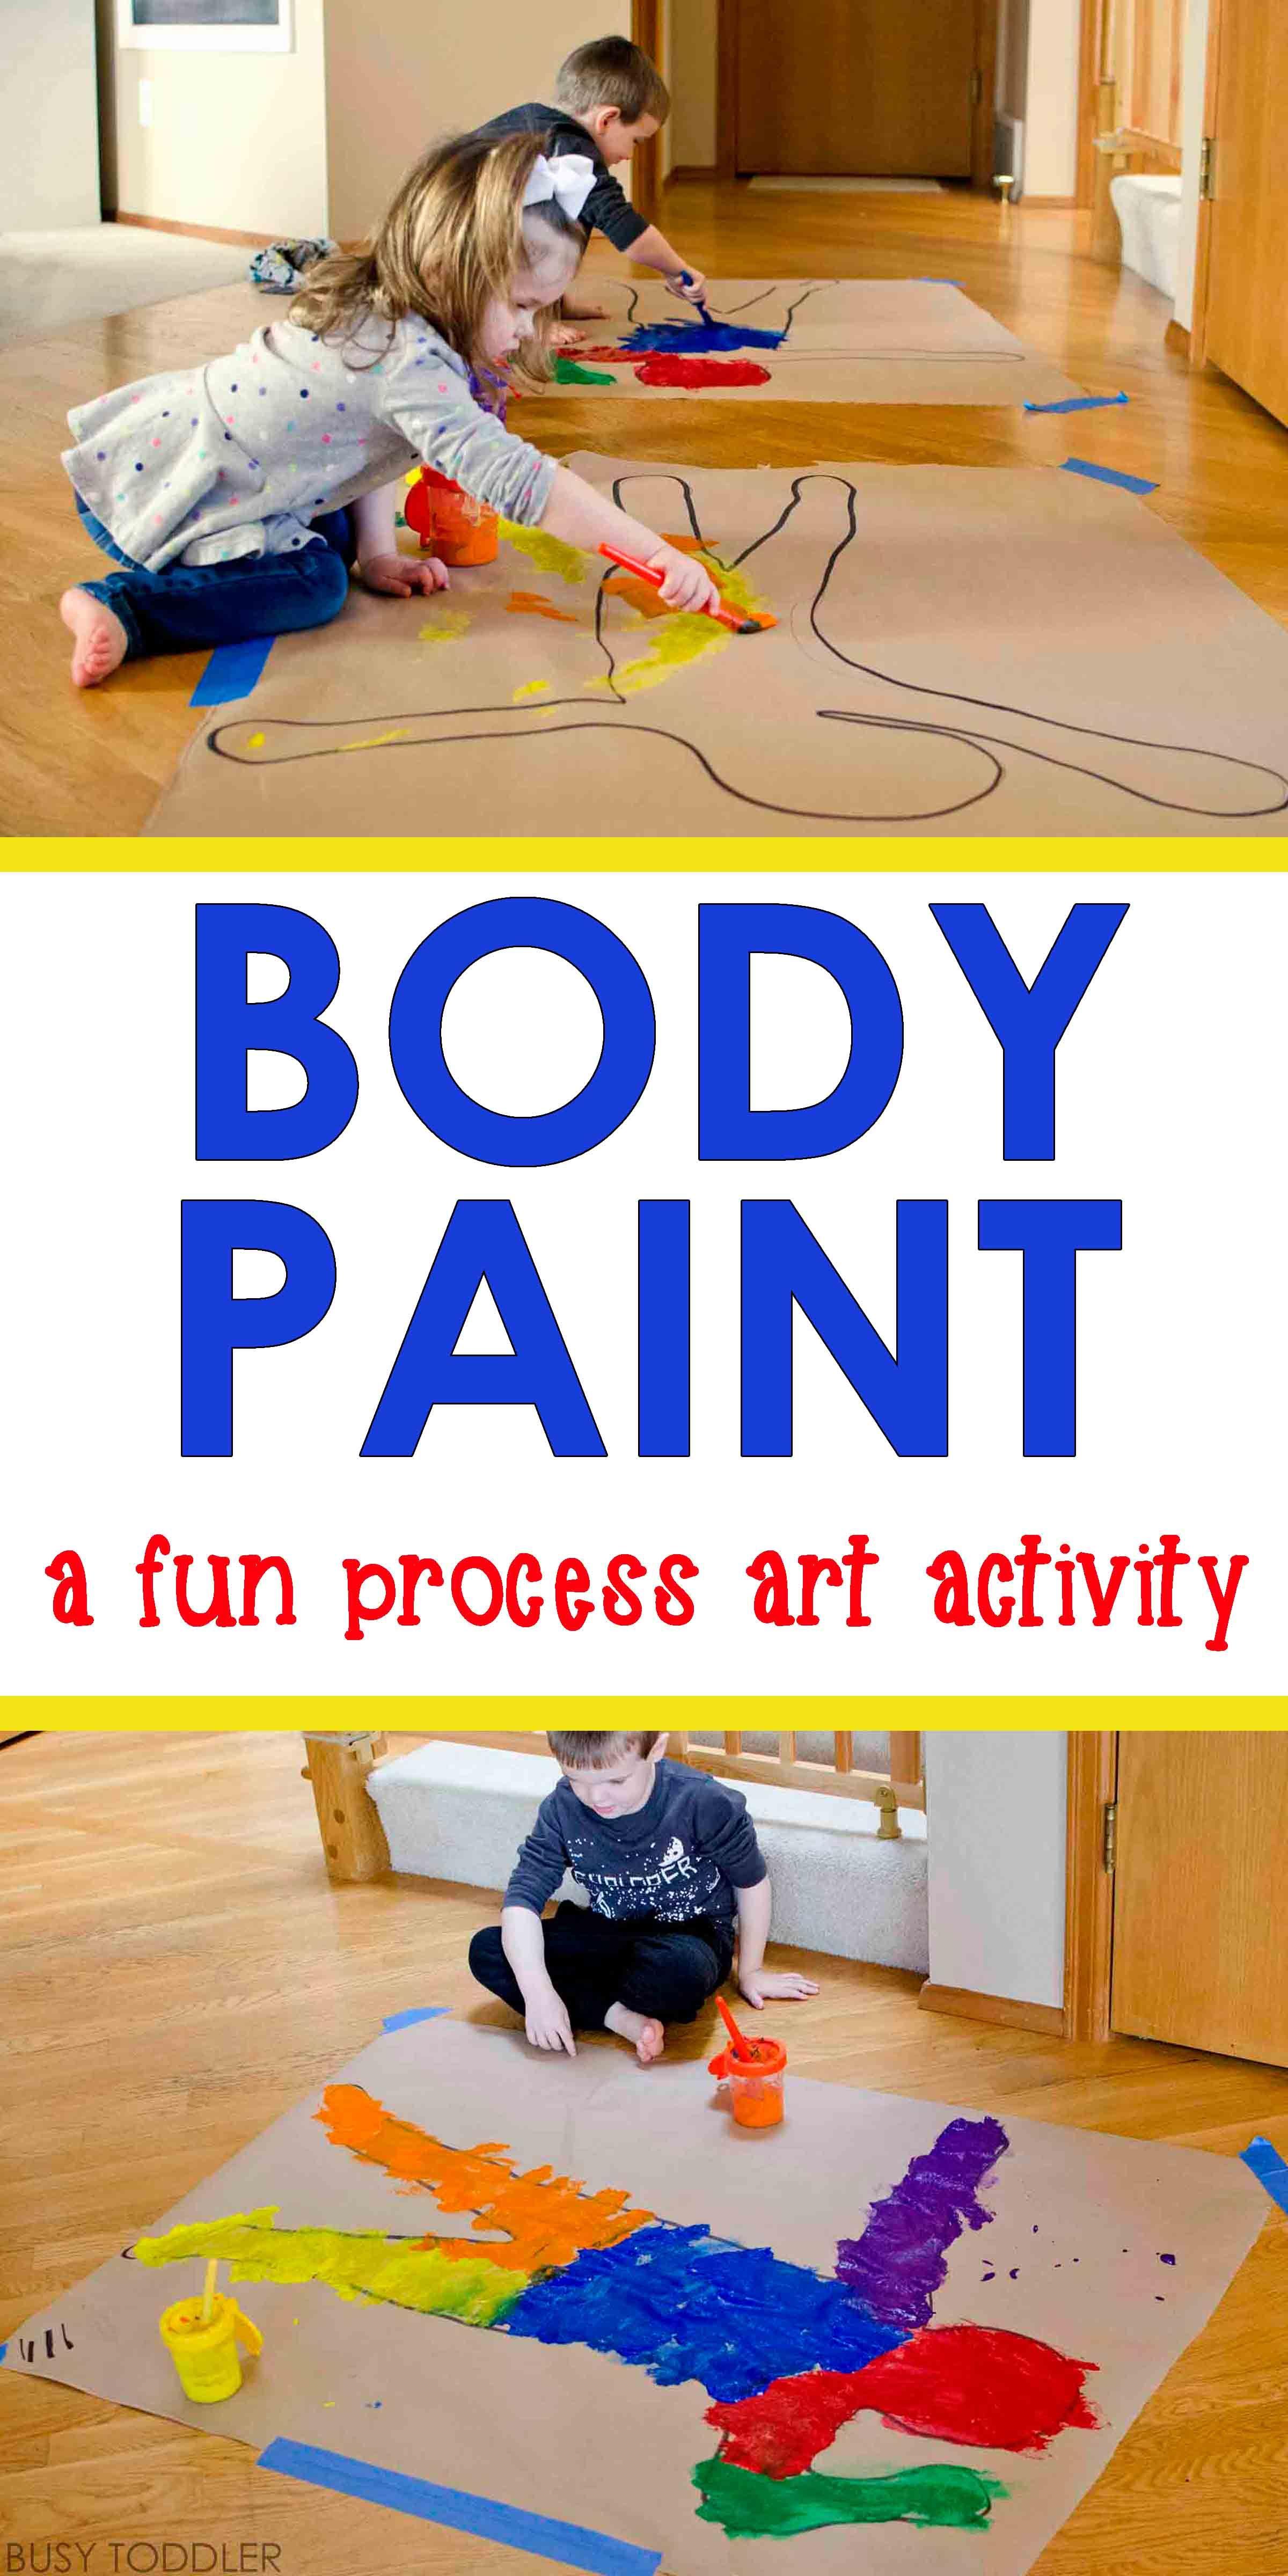 Body Paint Process Art